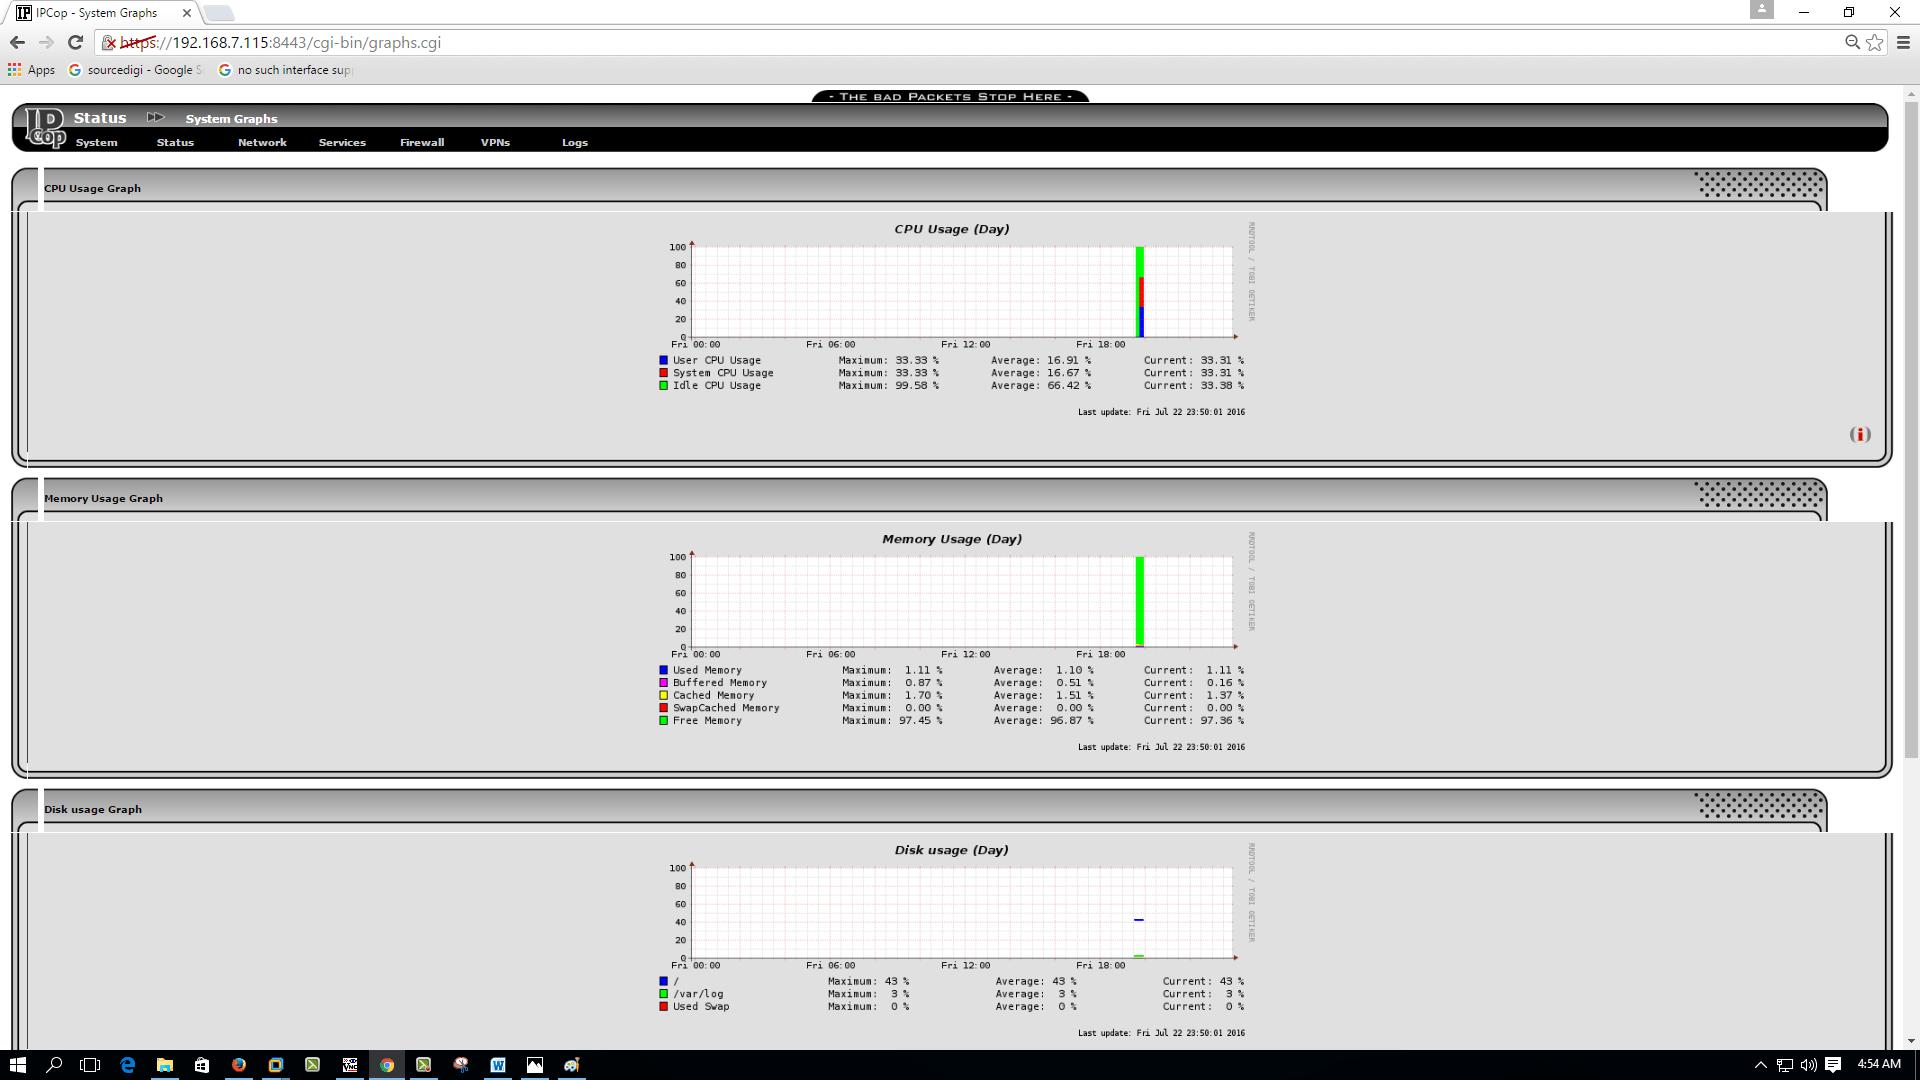 Installation-IPCop-manages-firewall-appliance-Linux-net-filter-framework-System-Graph